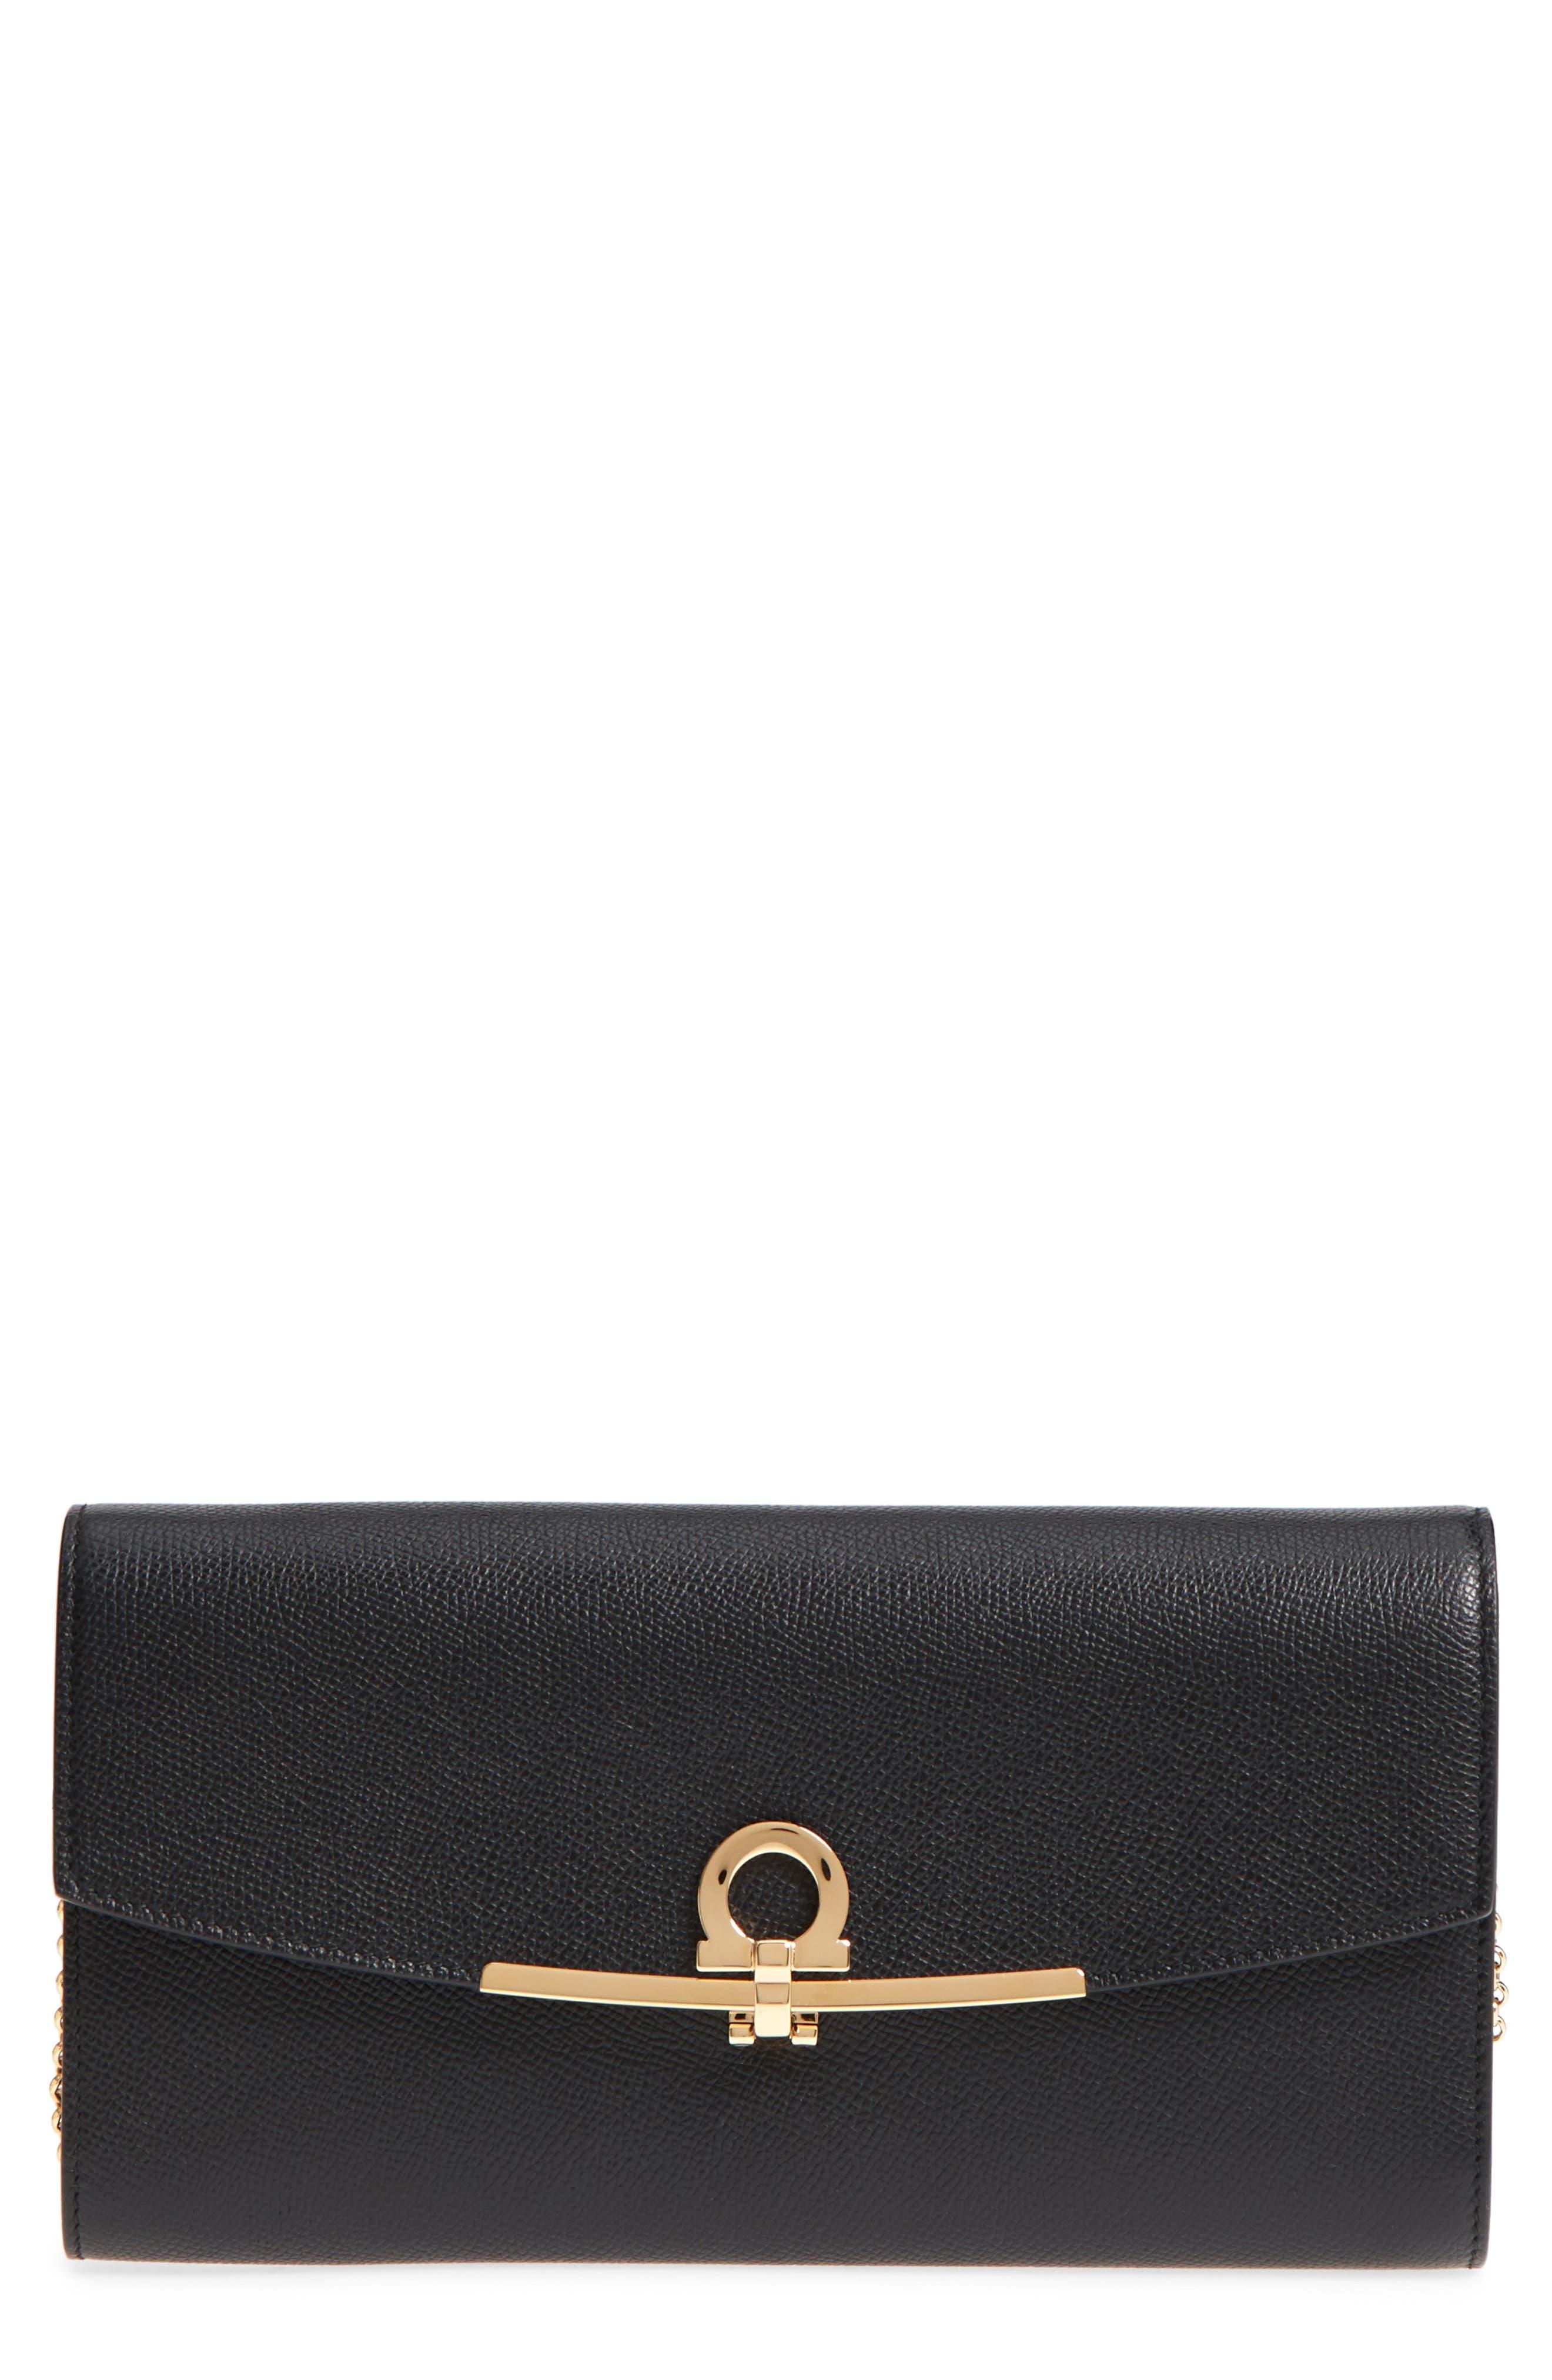 00967e9efdd549 Women's Salvatore Ferragamo Handbags | Nordstrom